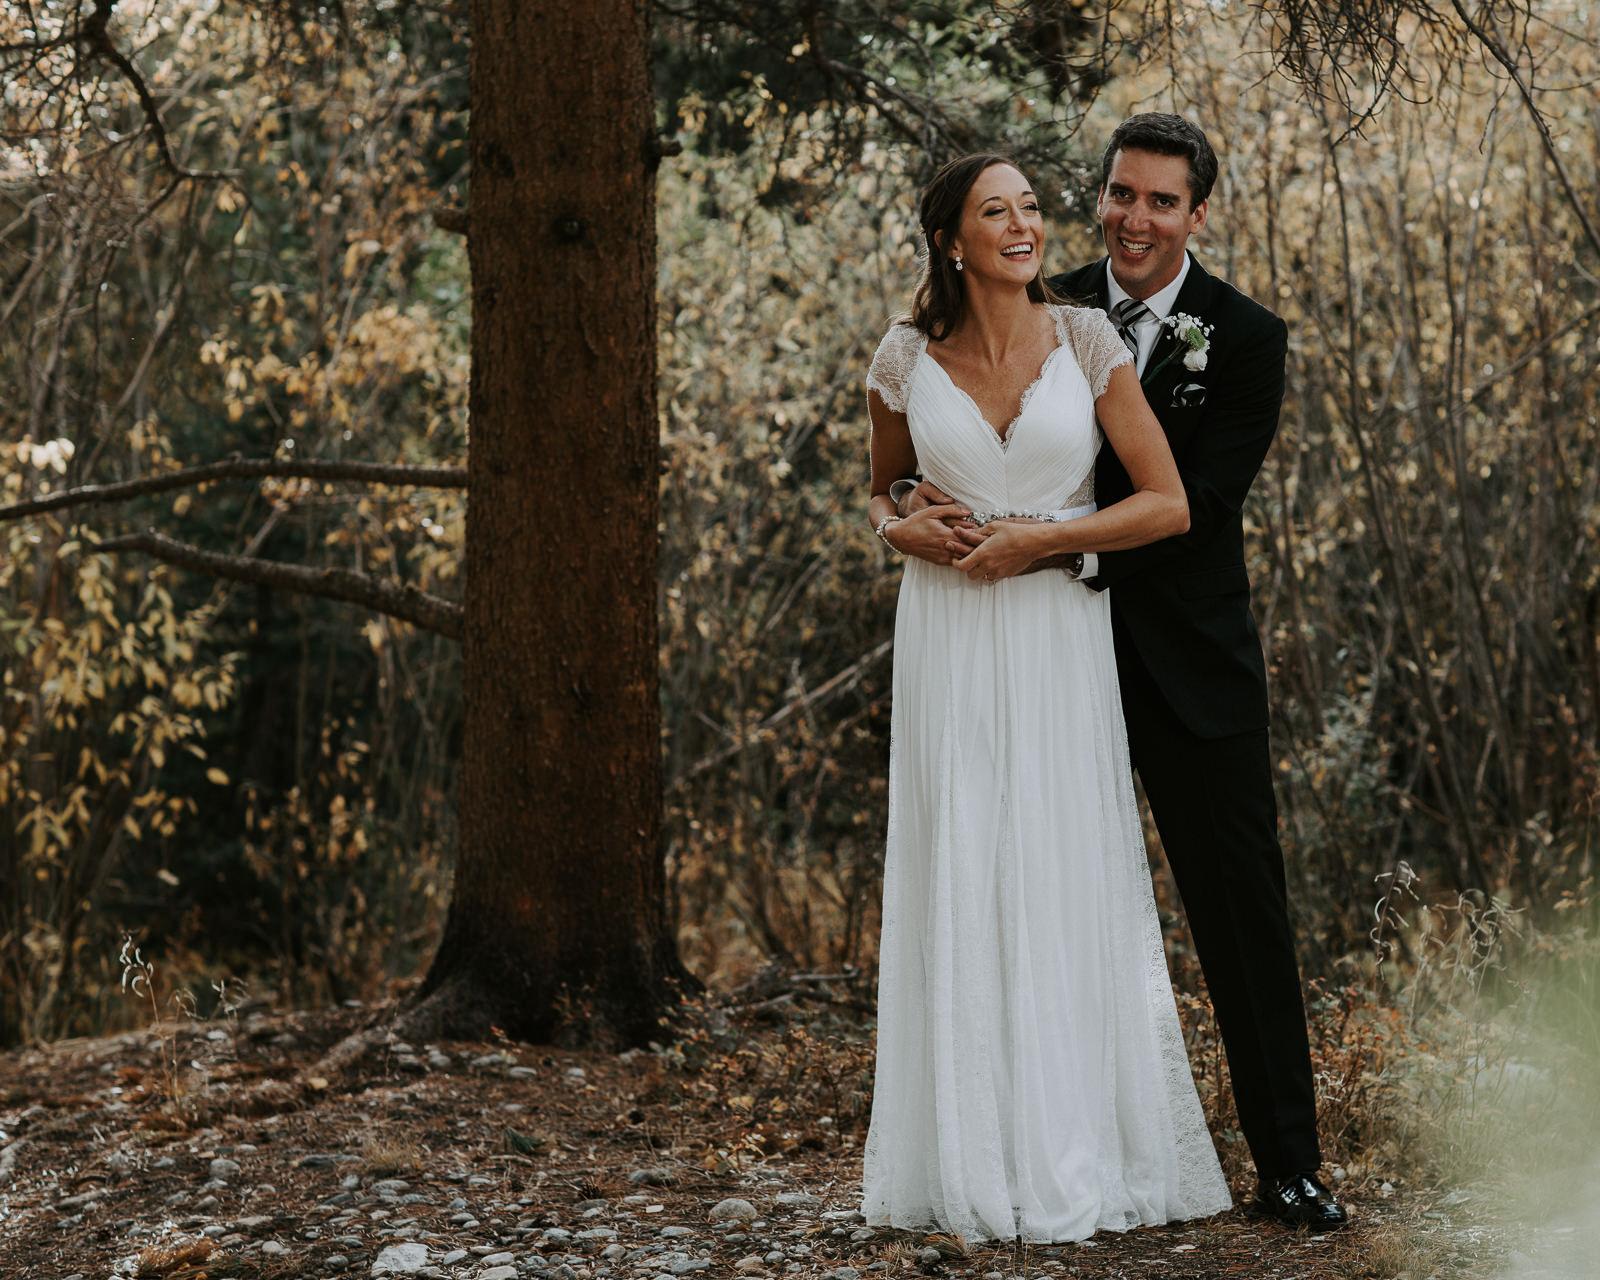 Quaking Aspen Amphitheater wedding fall colors Keystone Colorado